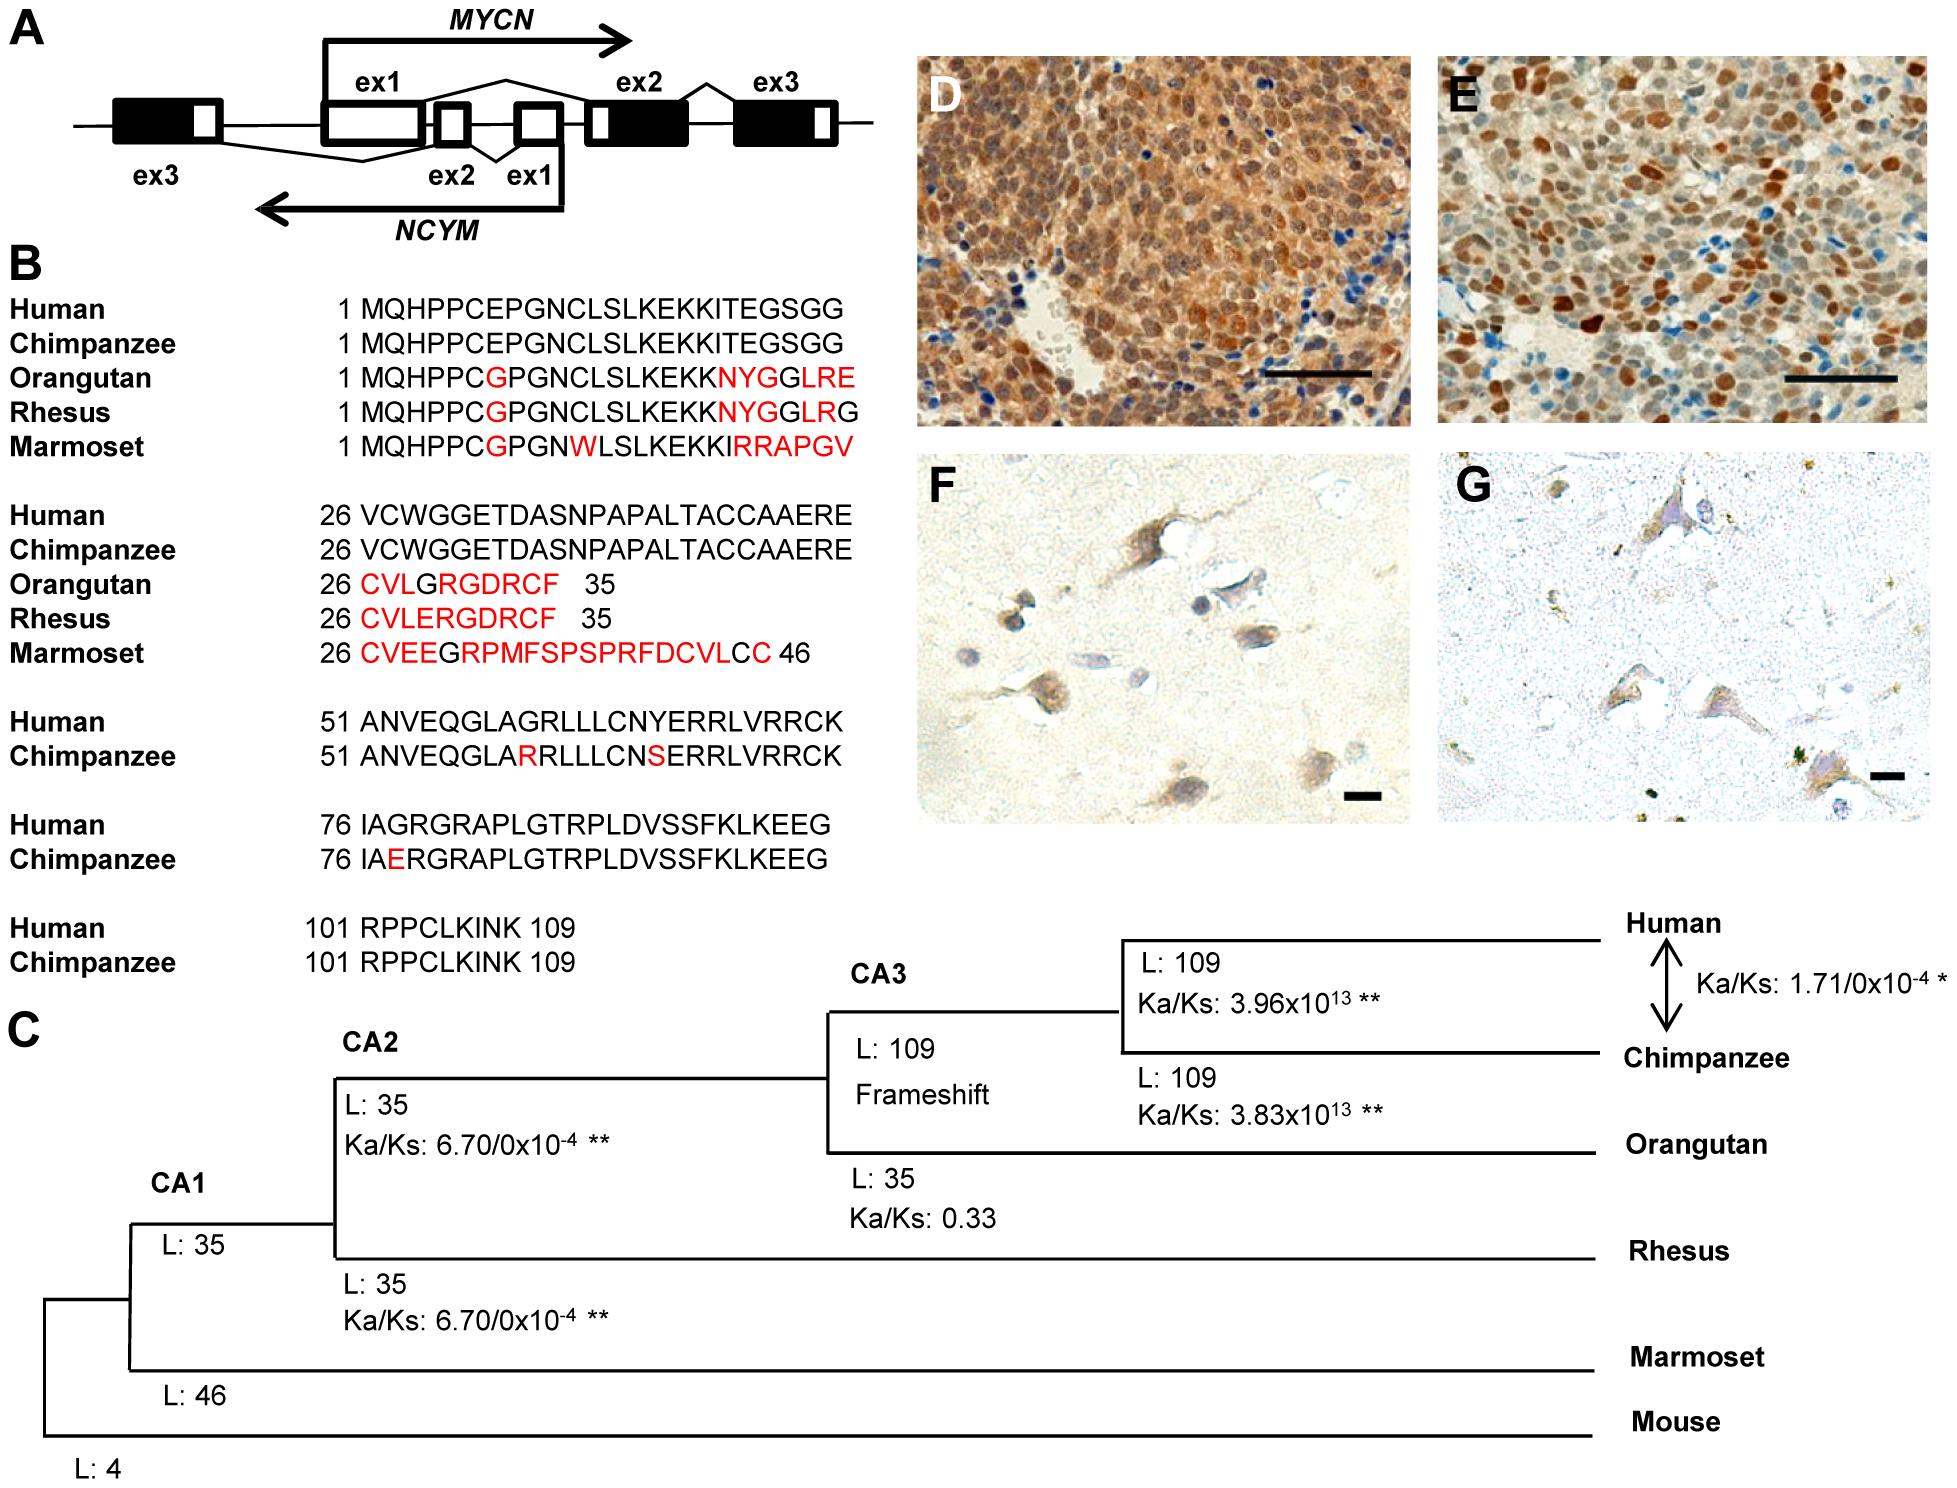 <i>NCYM</i> encodes a <i>de novo</i> evolved protein in humans.